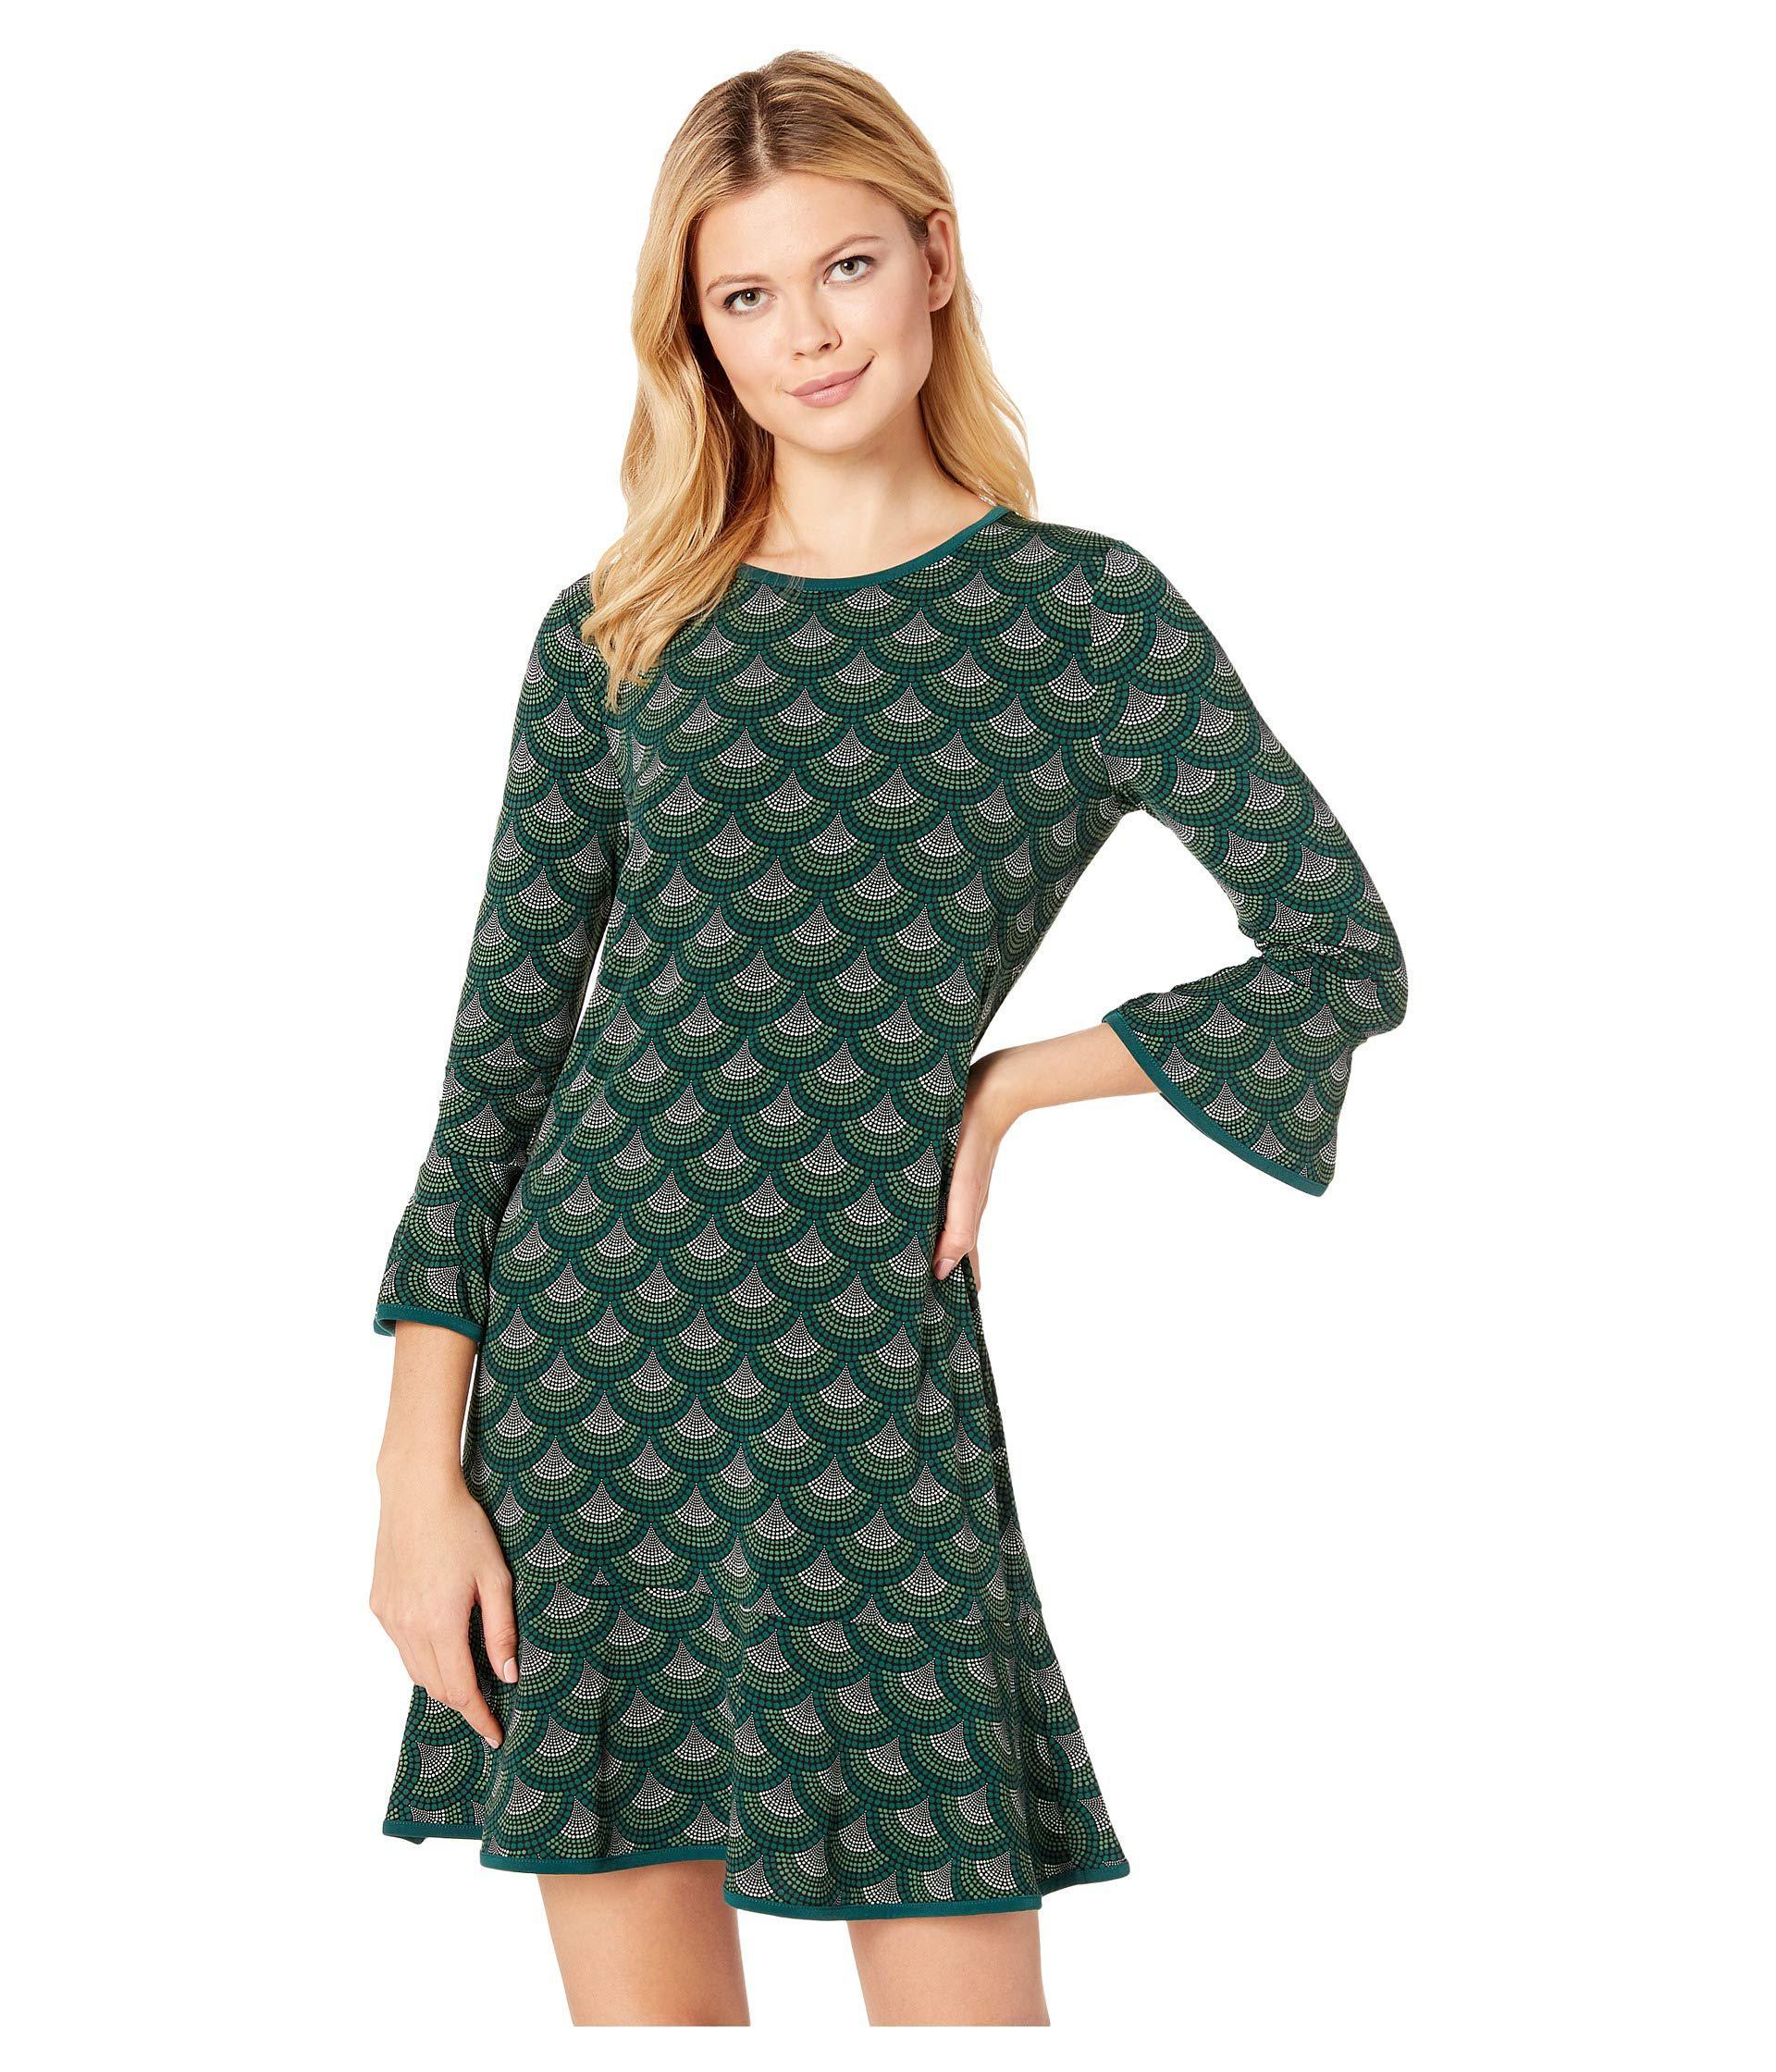 99c3331c27afb Green Chandelier Scallop Flounce Sleeve Dress (dark Emerald) Women s Dress